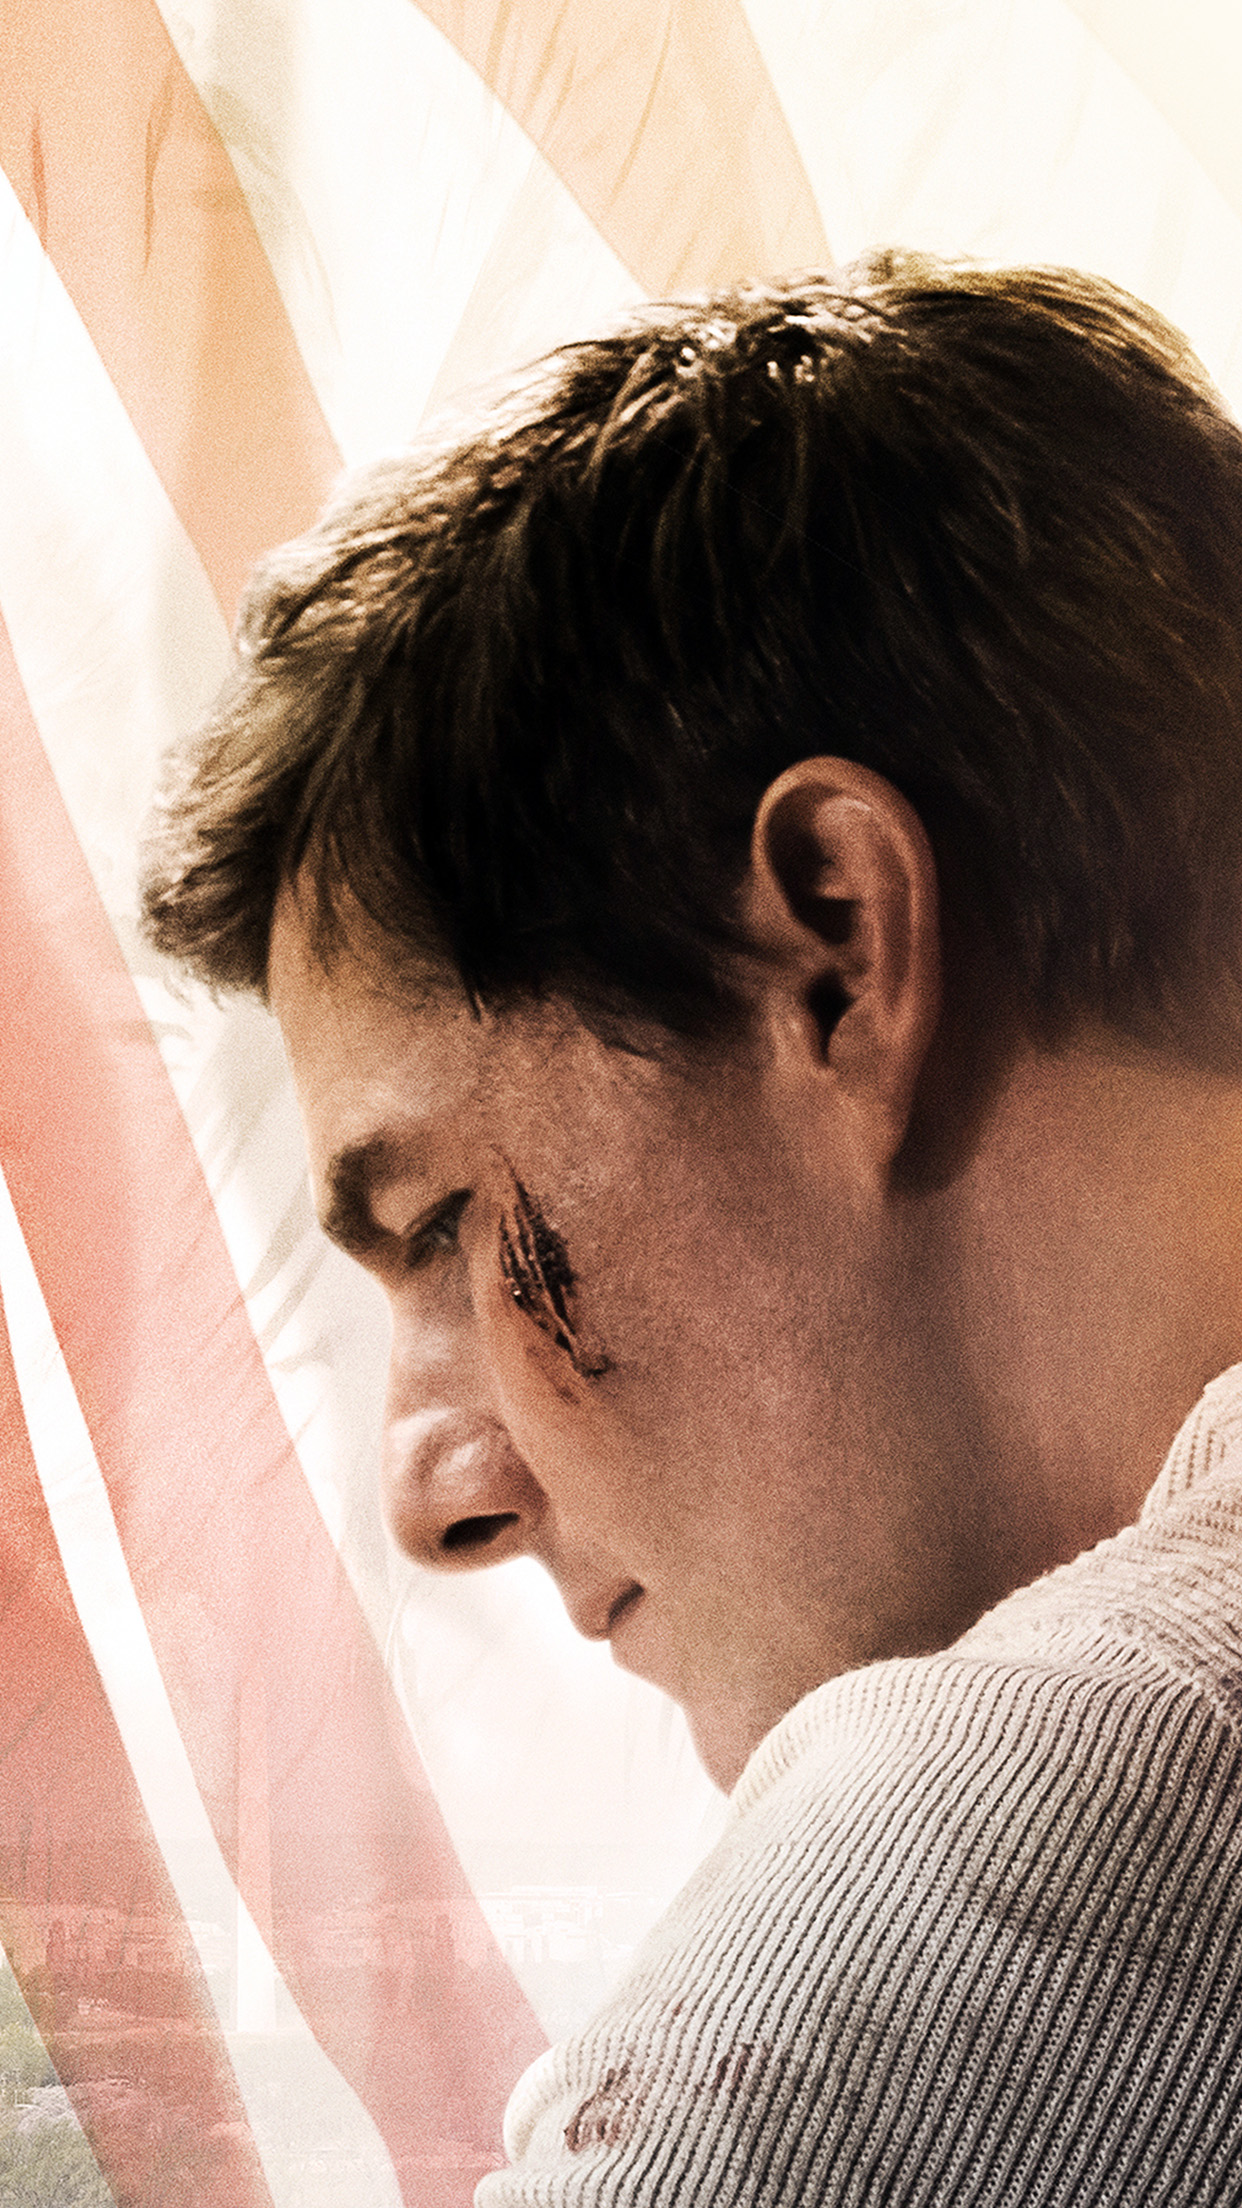 Hj87 Jack Reacher Tom Cruise Film Poster - Jack Reacher 2 Movie Poster , HD Wallpaper & Backgrounds